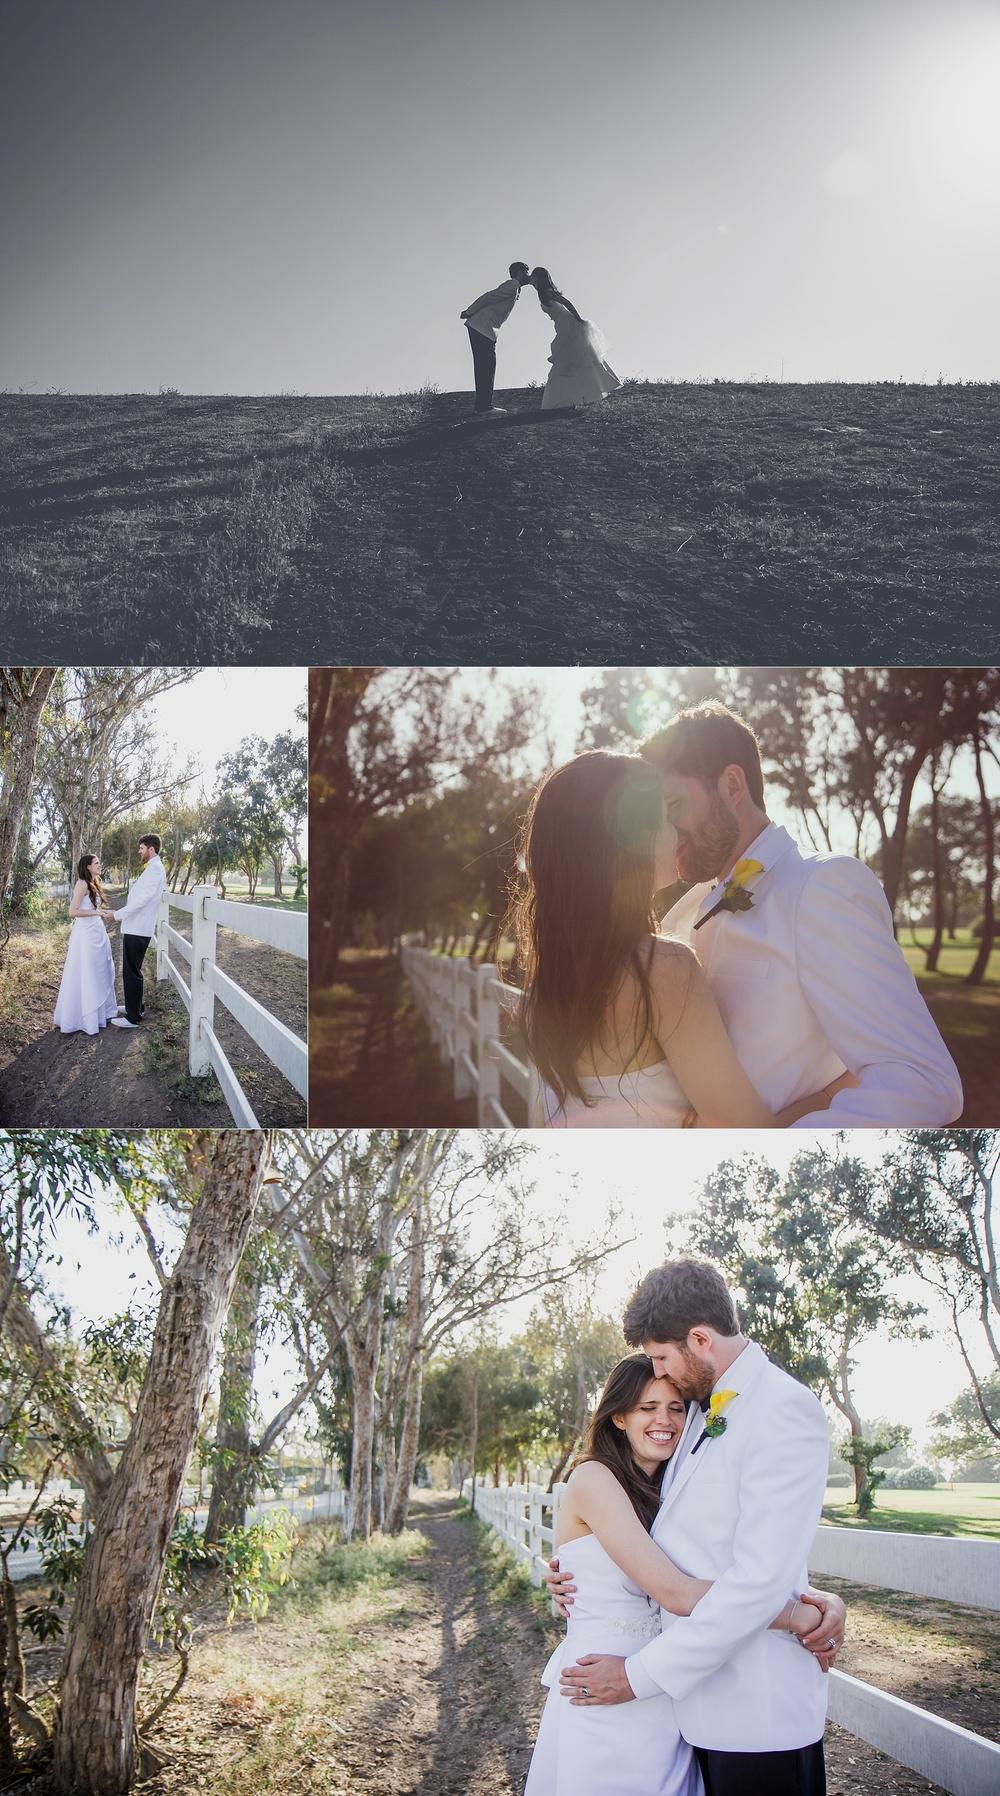 ourwedding_kristenlynettephoto-474_web.jpg